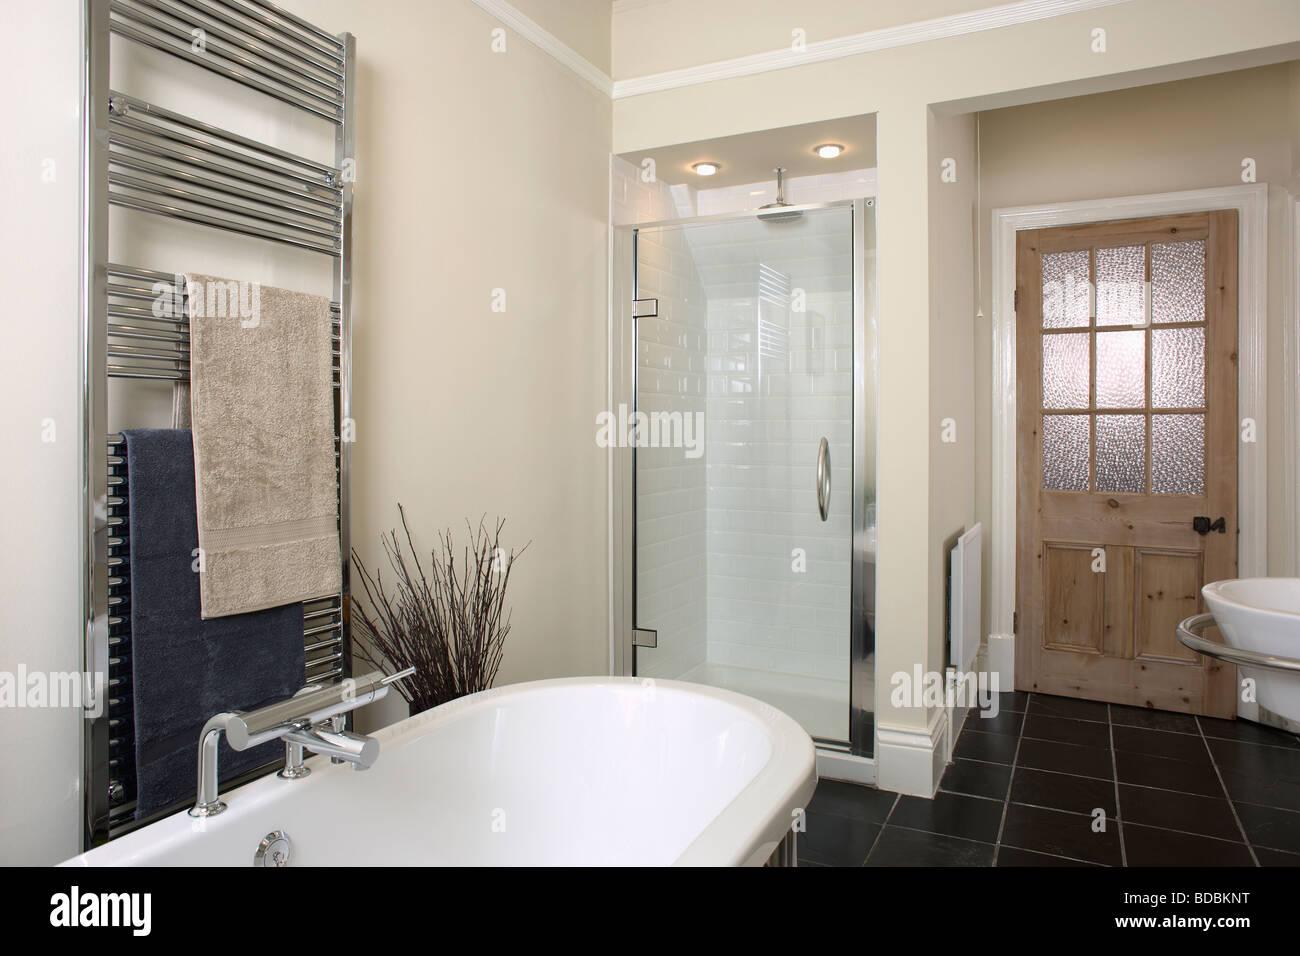 Towel rails for bathroom - Stainless Steel Heated Towel Rail Above Bath In Modern Beige Bathroom With Glass Door On Shower Unit